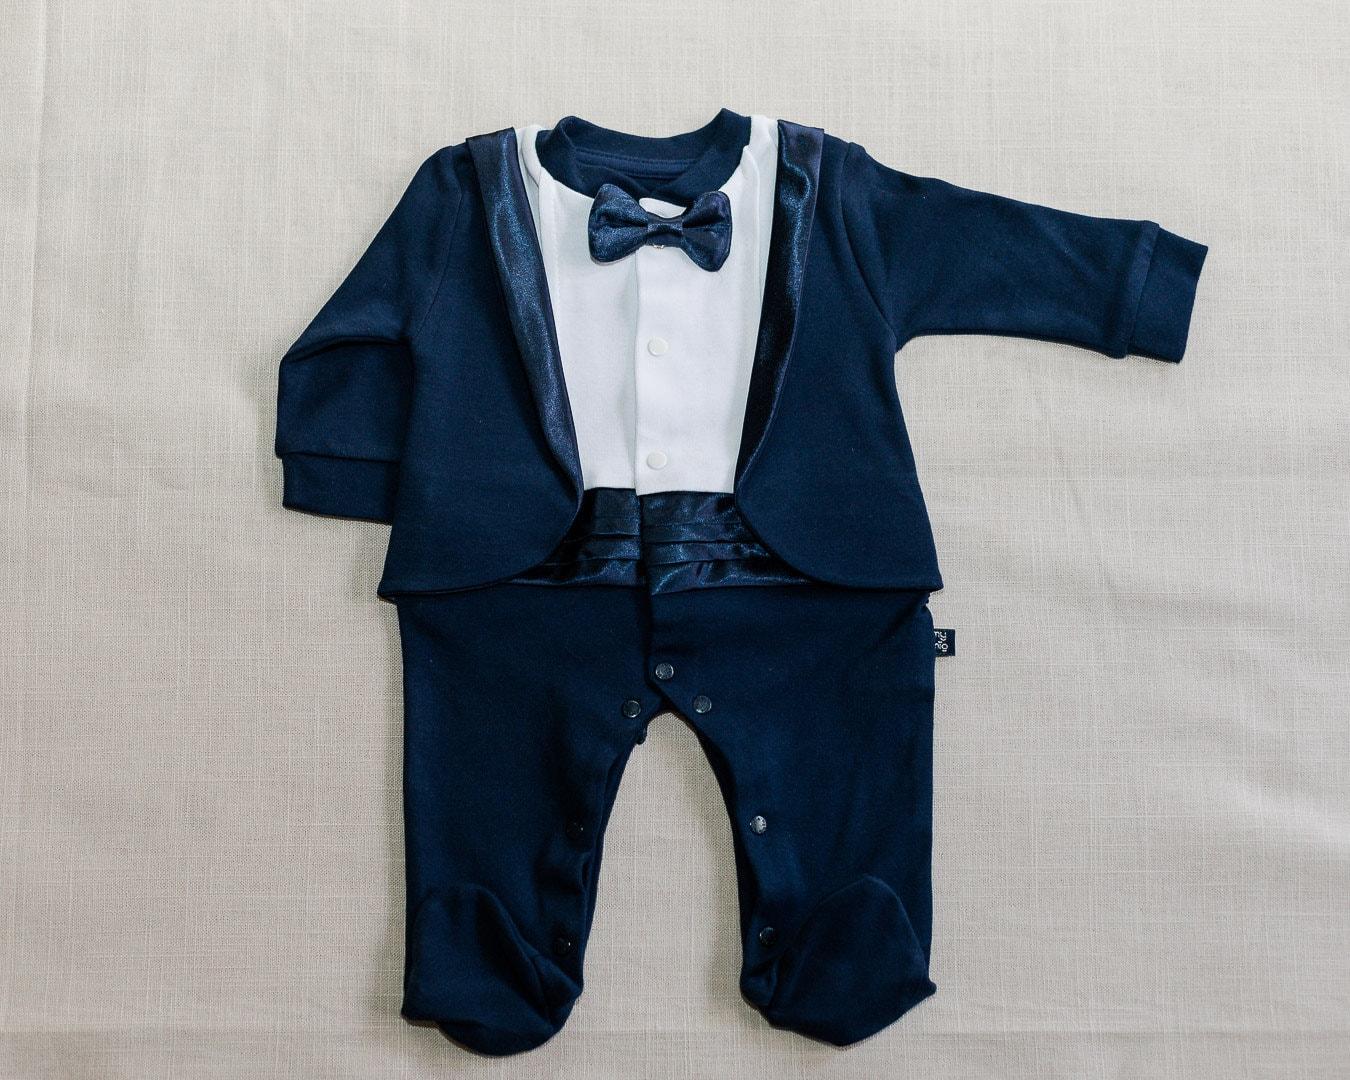 db79956f0 Baby wedding outfit baby tuxedo Newborn tuxedo baby boy   Etsy